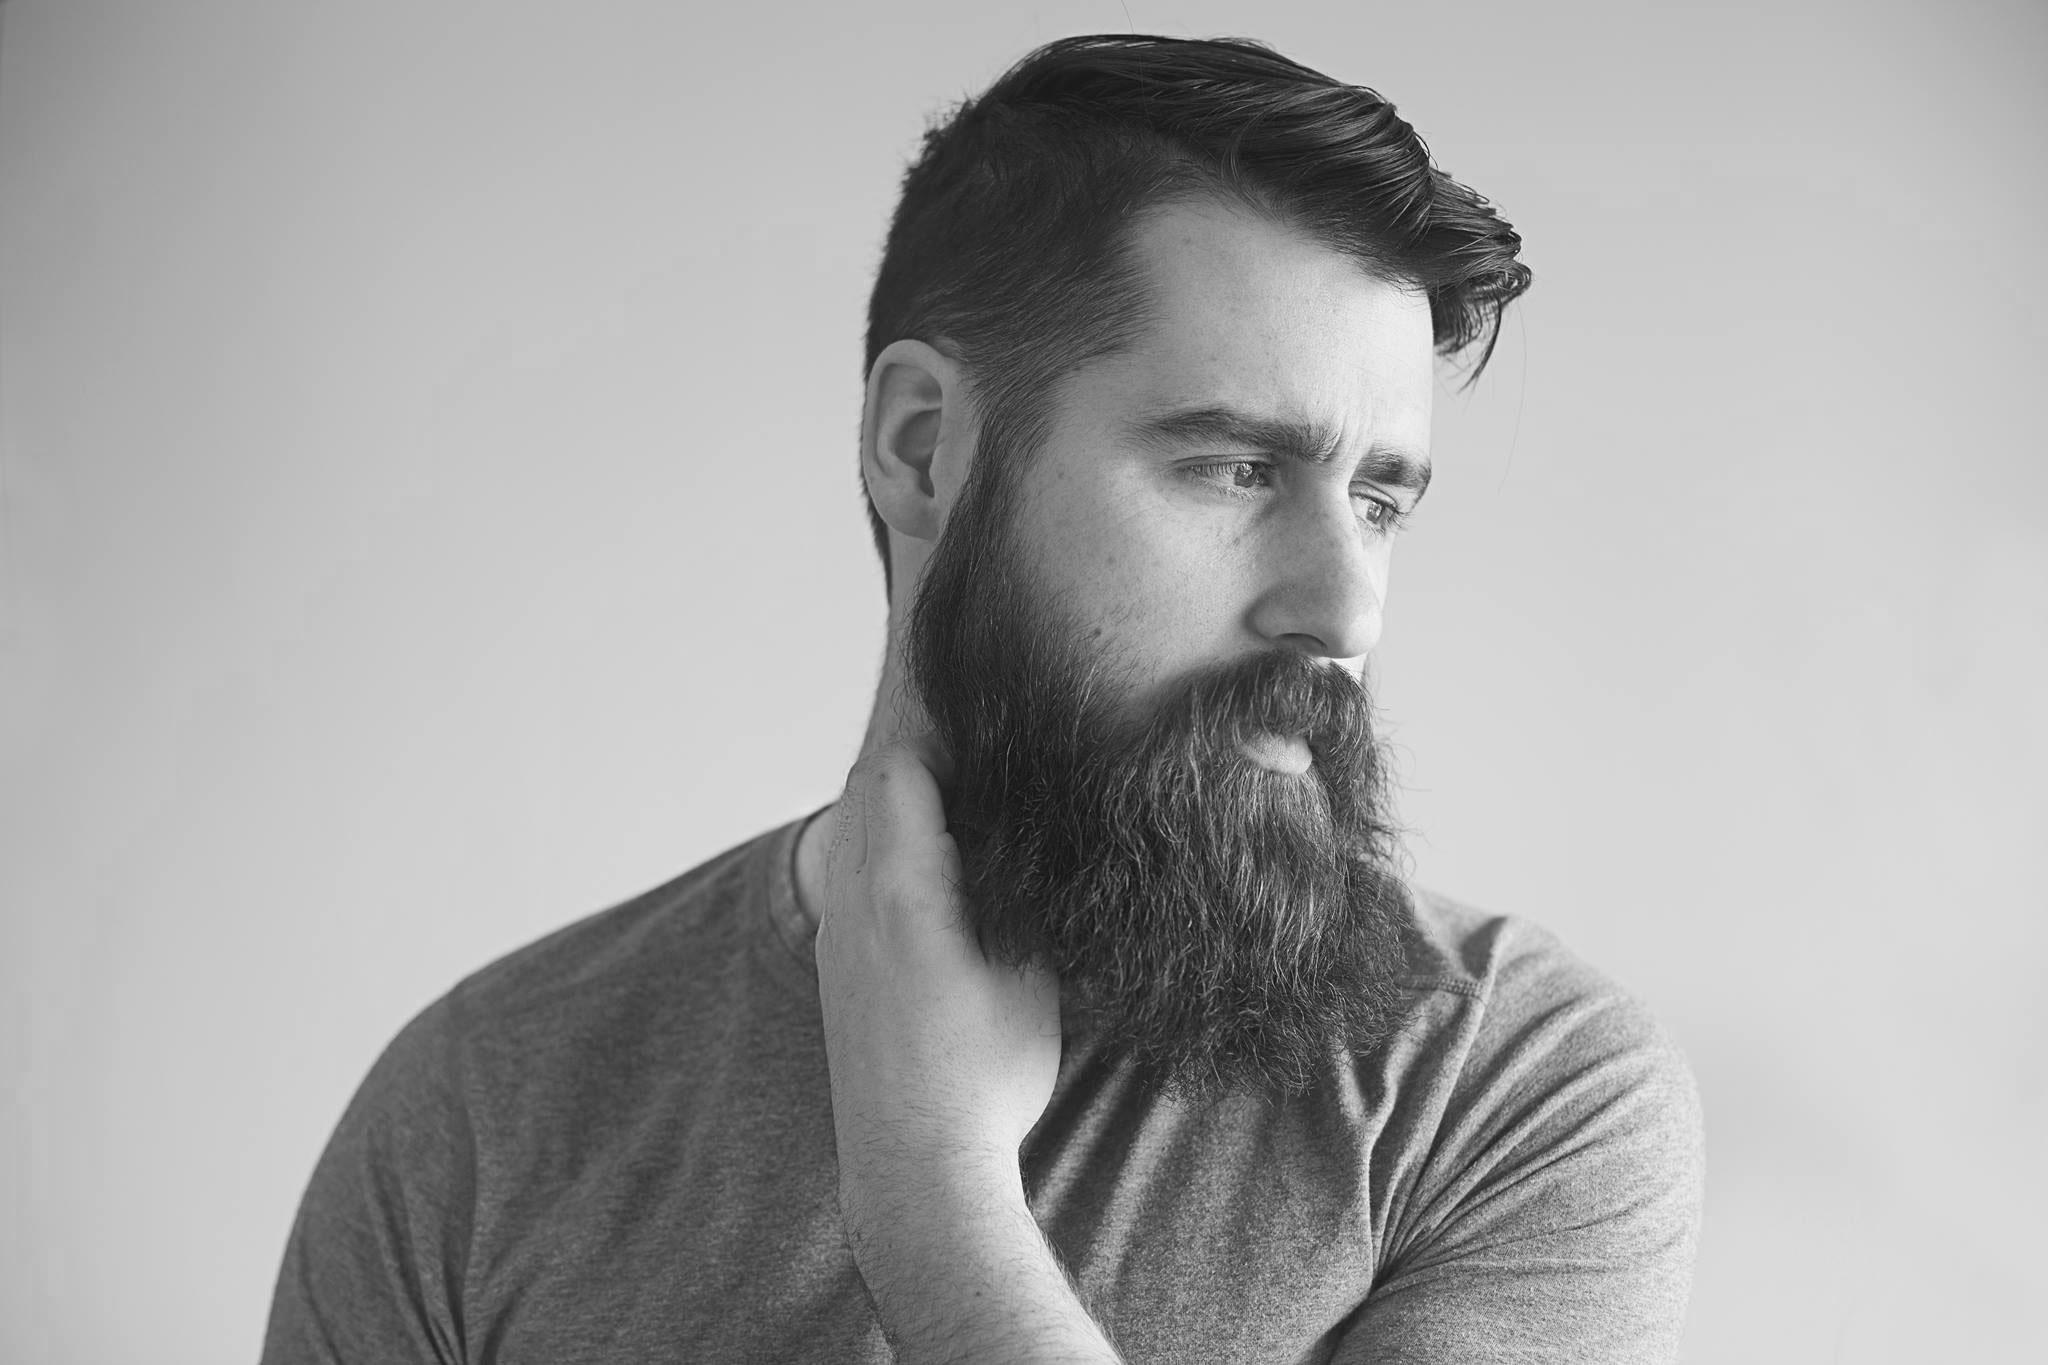 comment tailler une barbe sans la g cher. Black Bedroom Furniture Sets. Home Design Ideas